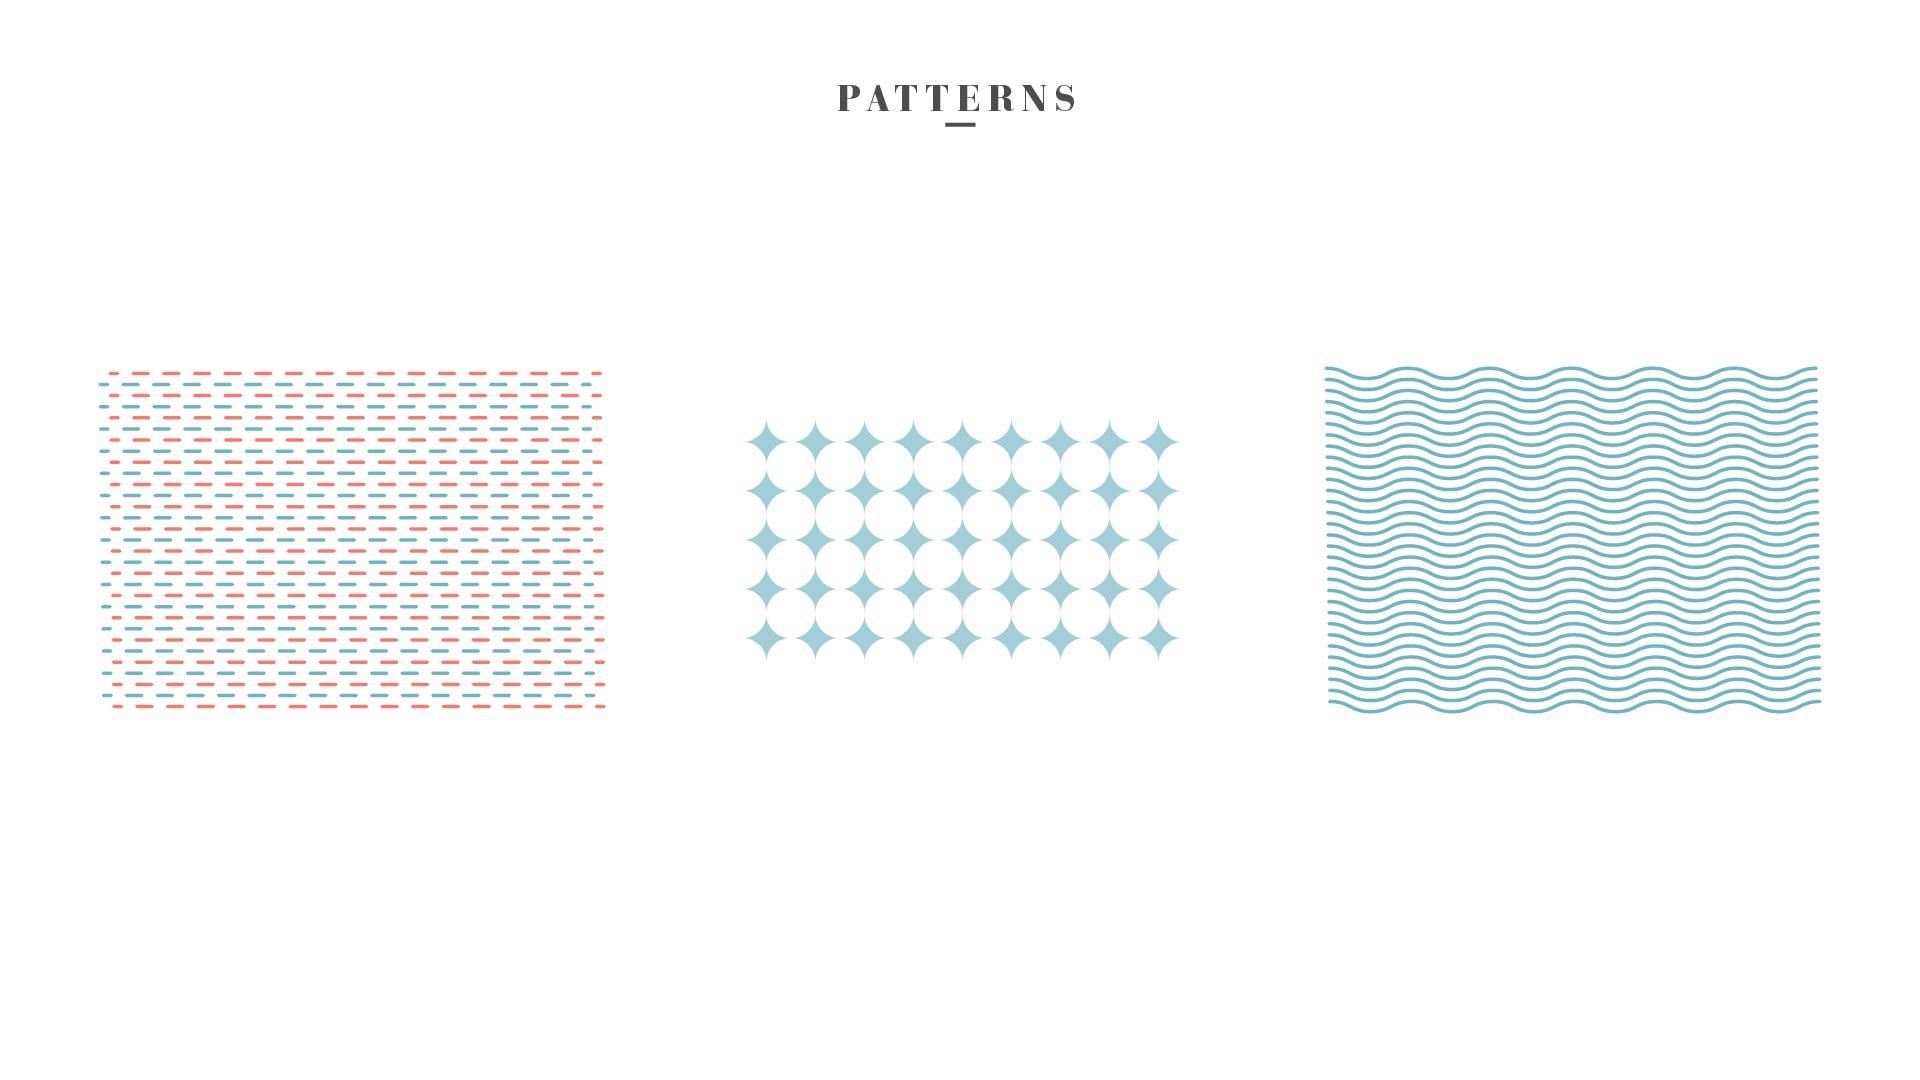 5 brand patterns